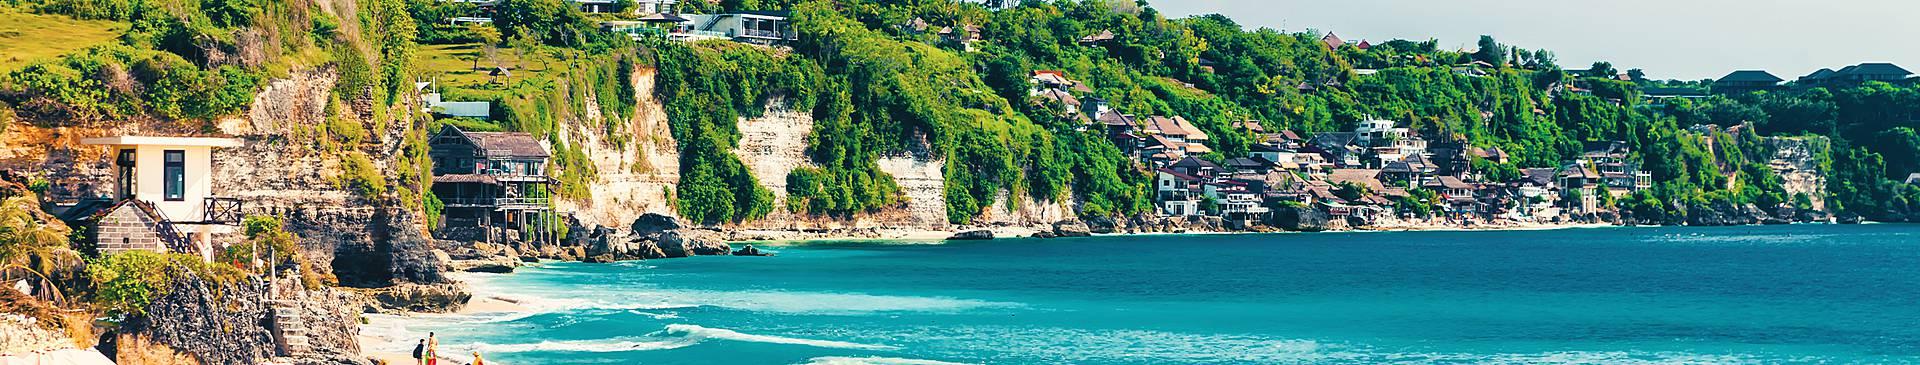 Summer in Bali